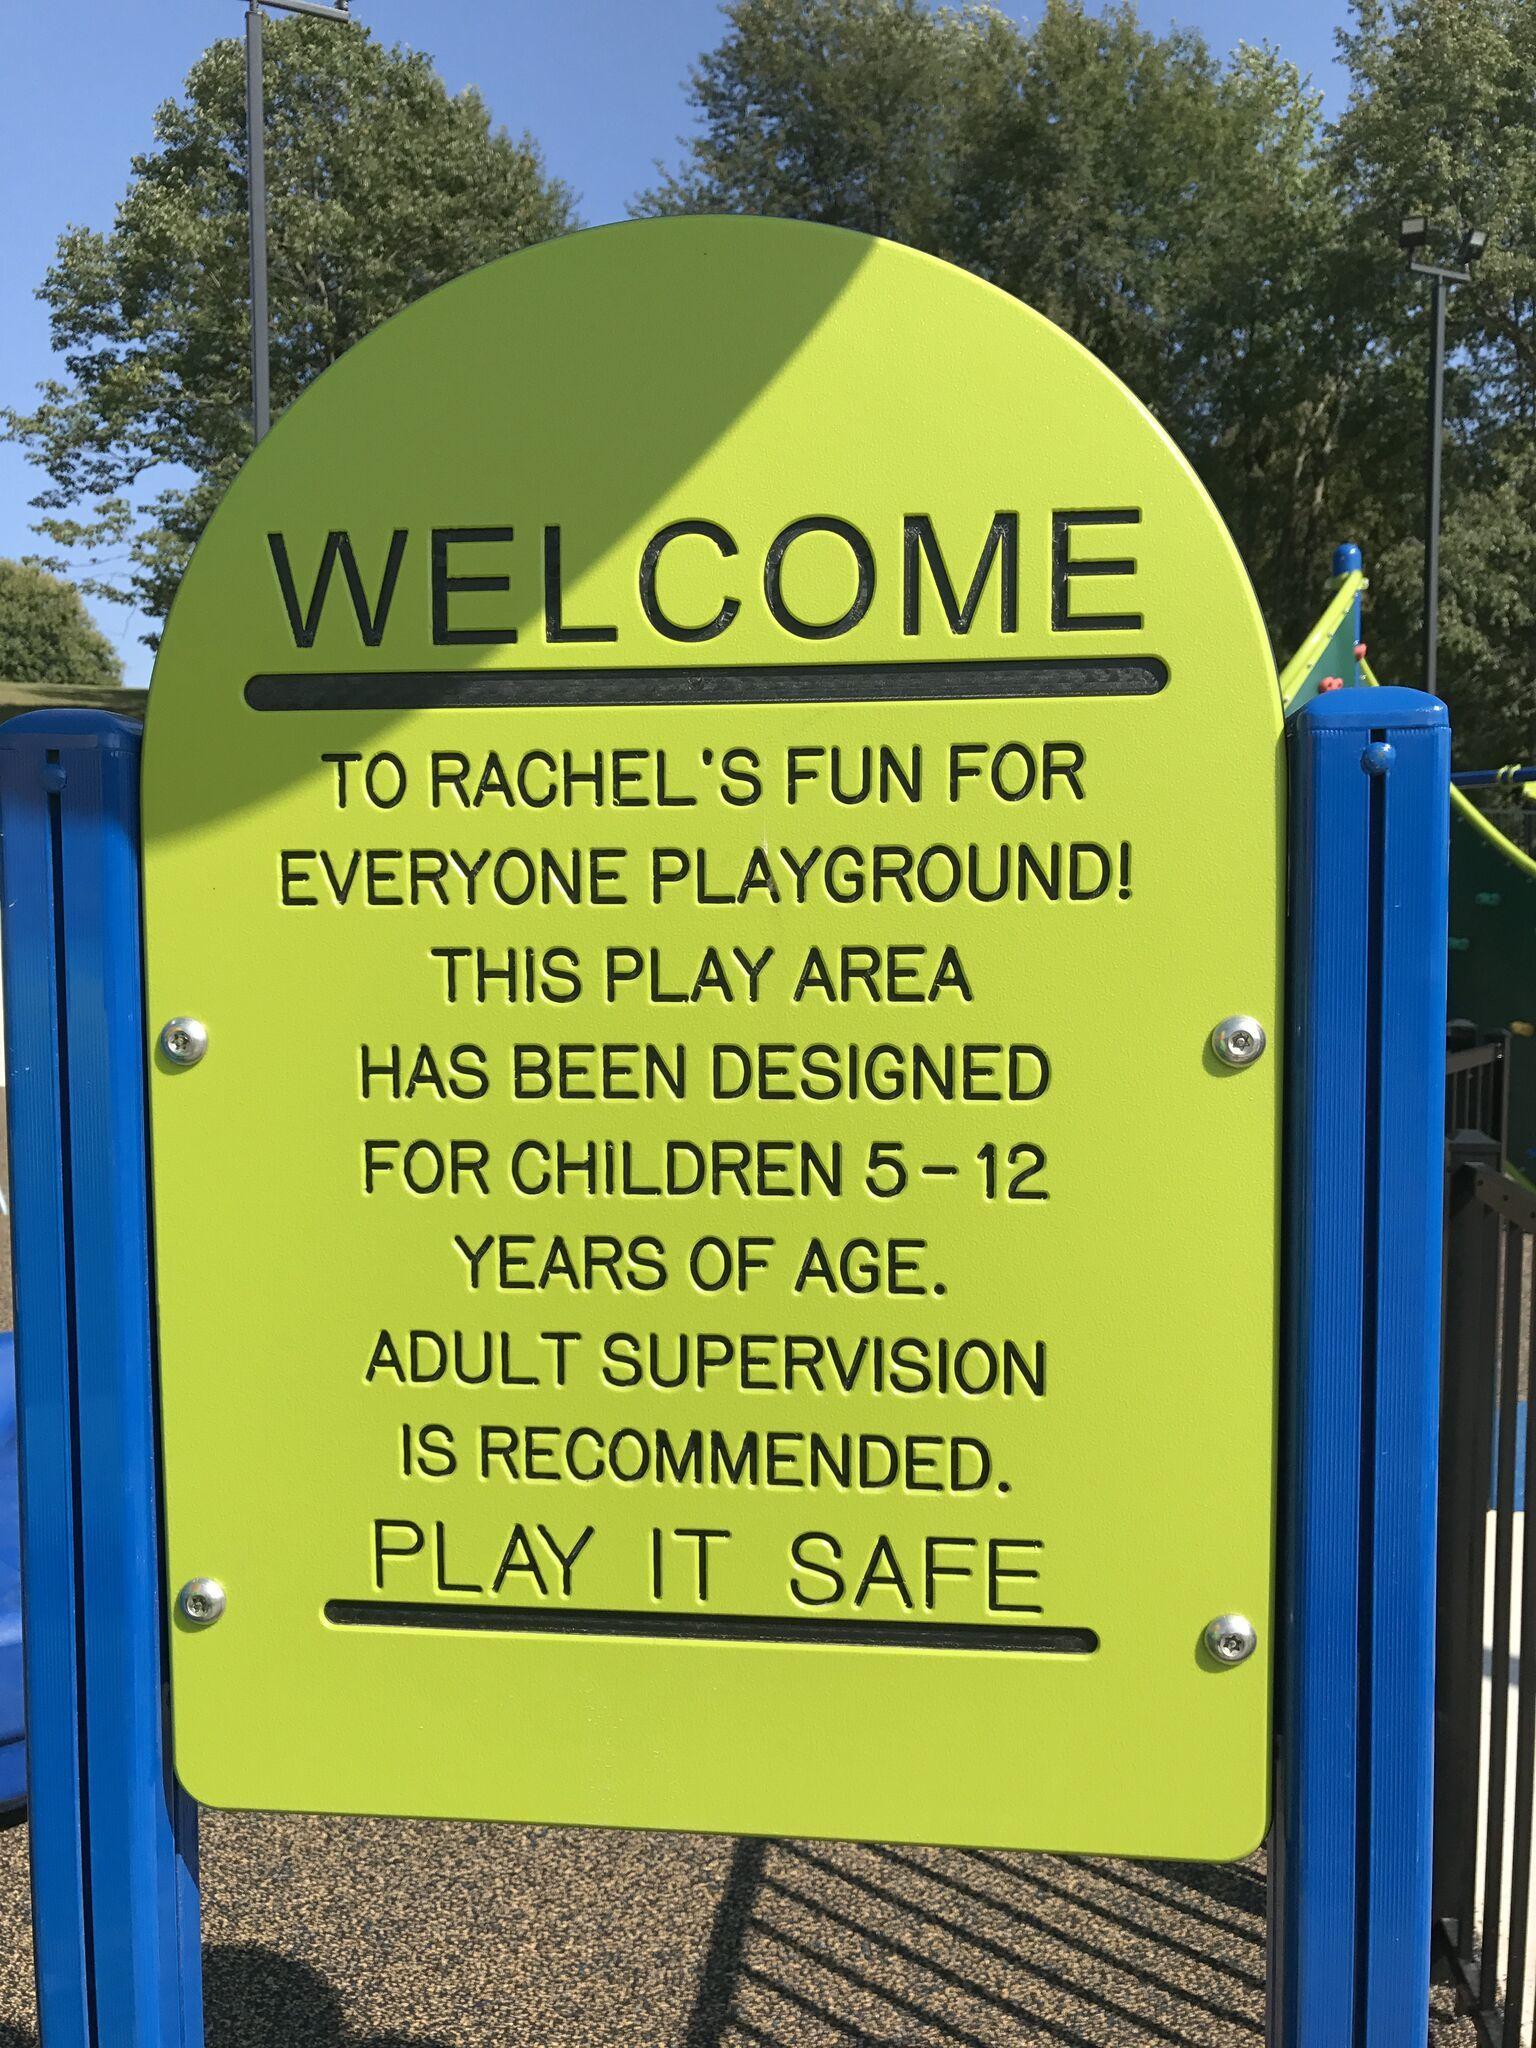 Rachel Ritchie's Fun for Everyone Playground